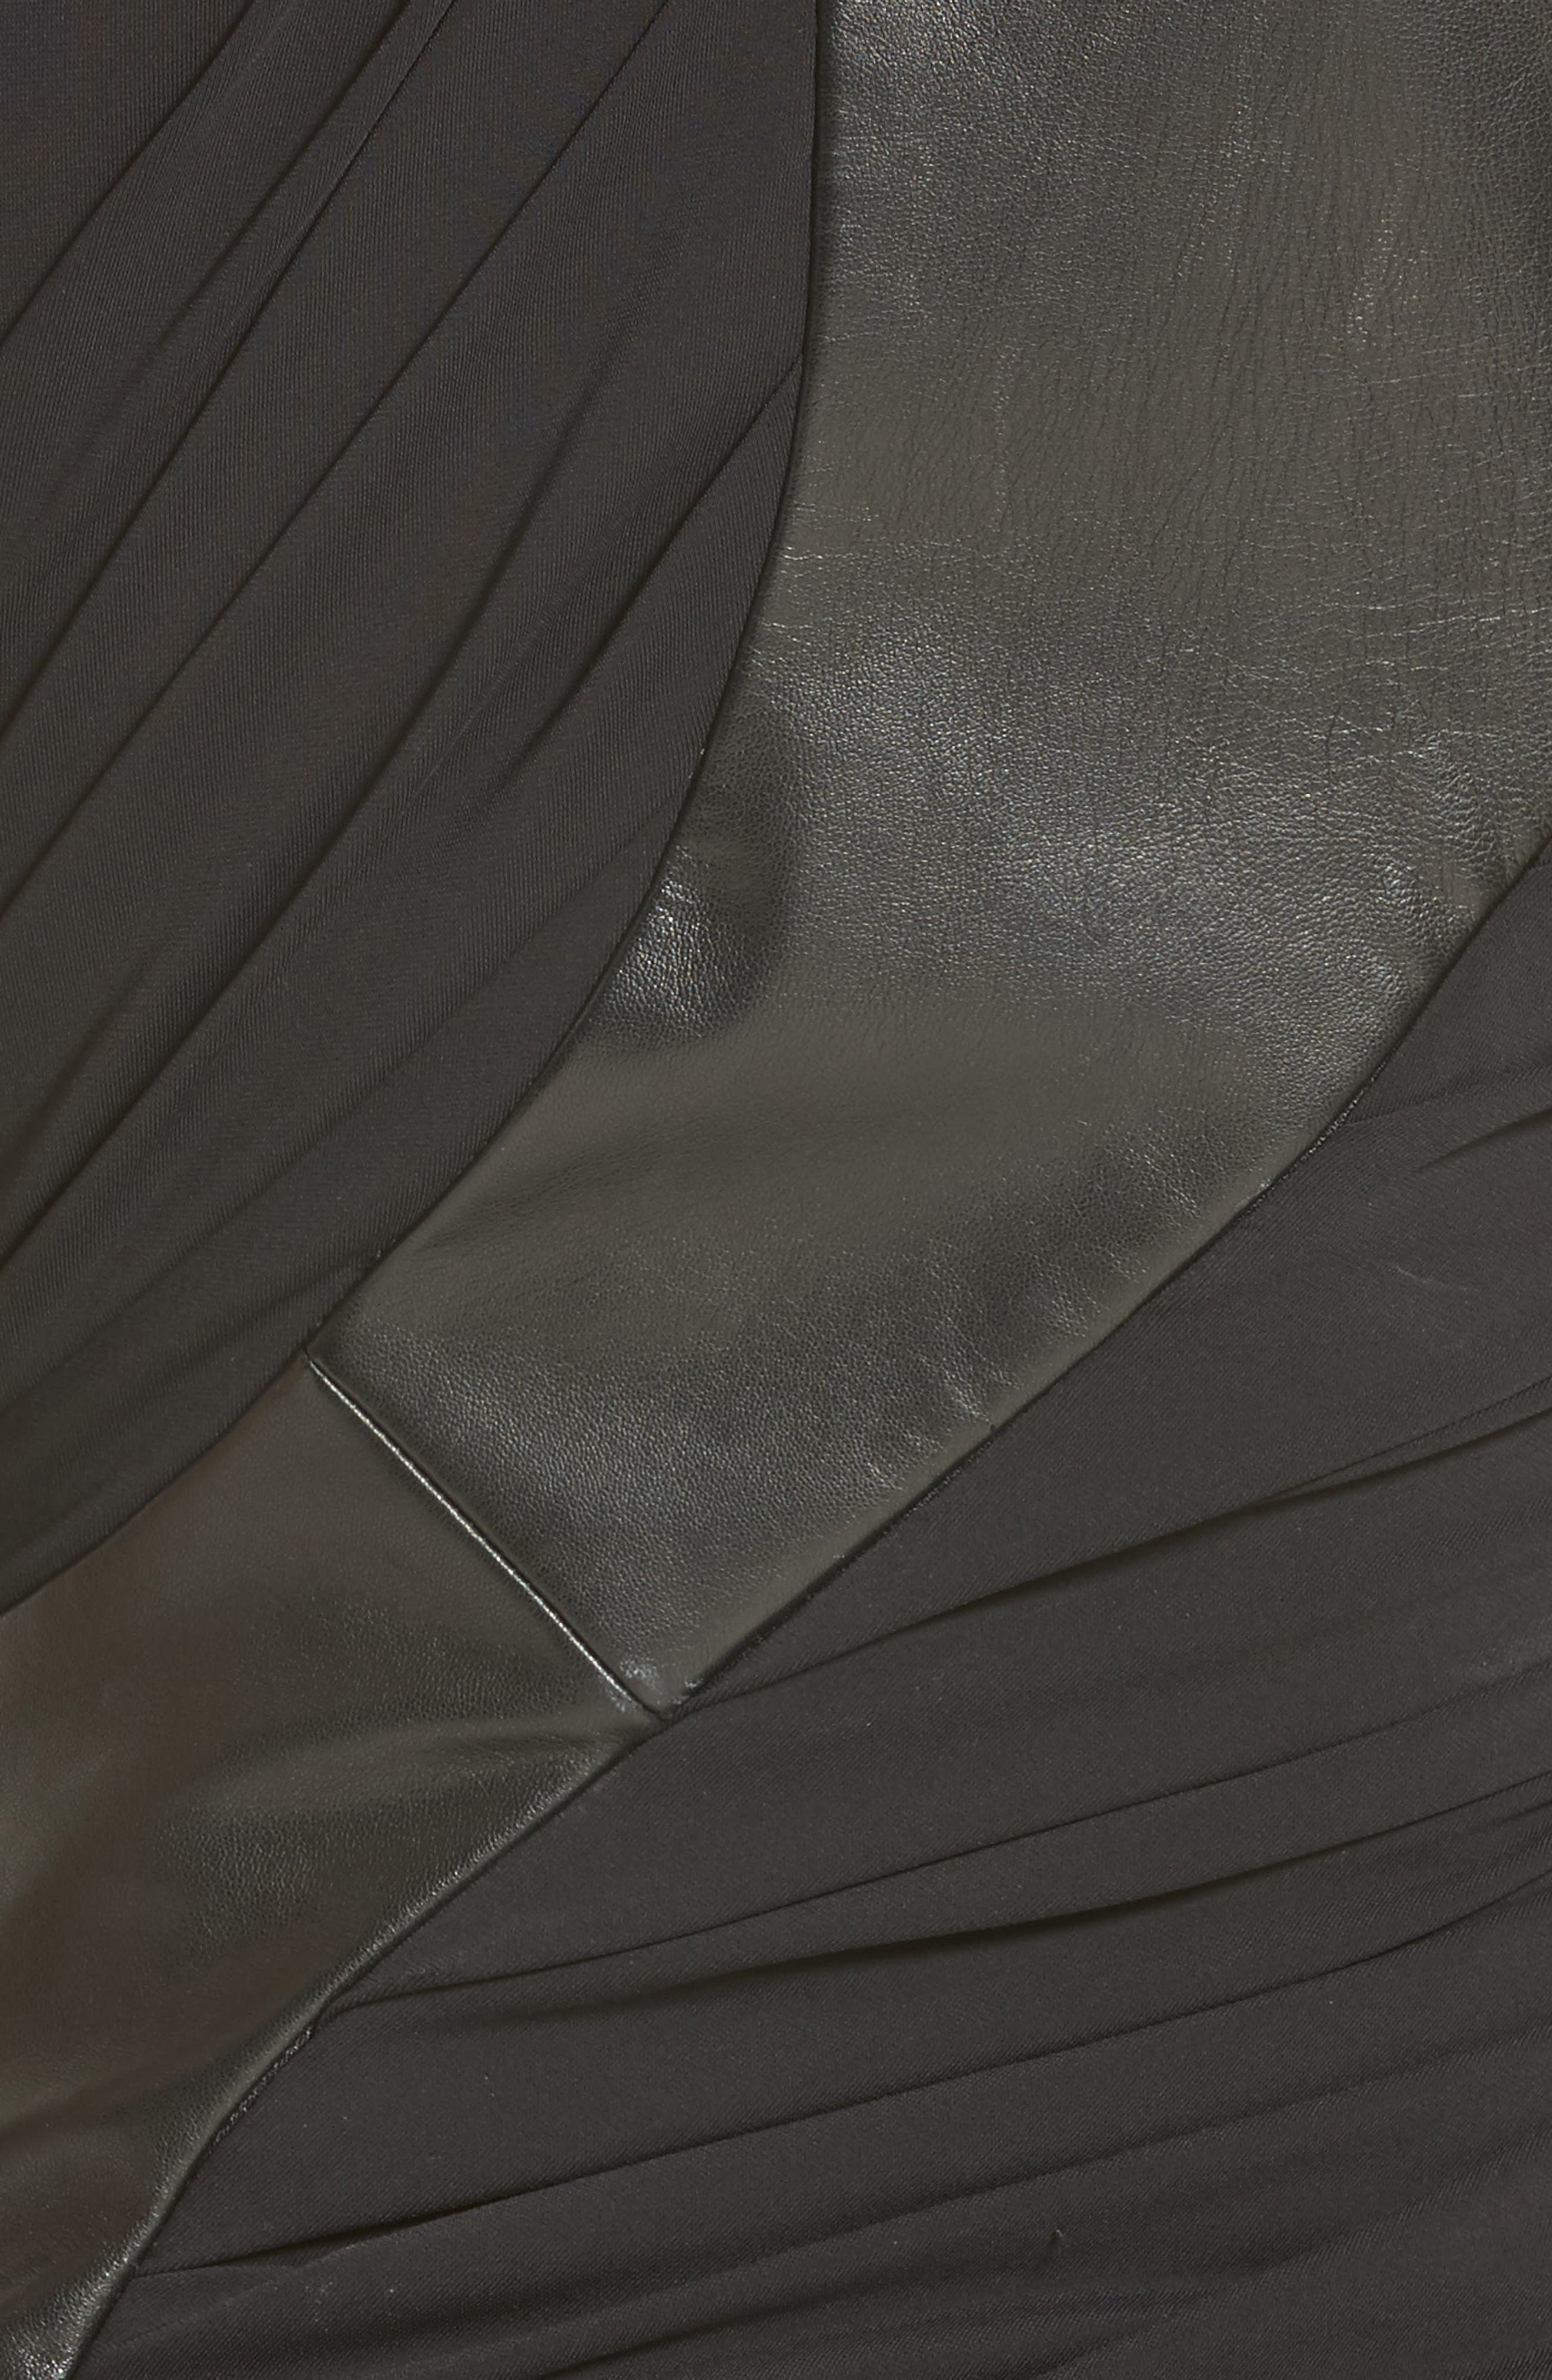 Draped Jersey & Leather Dress,                             Alternate thumbnail 3, color,                             Onyx